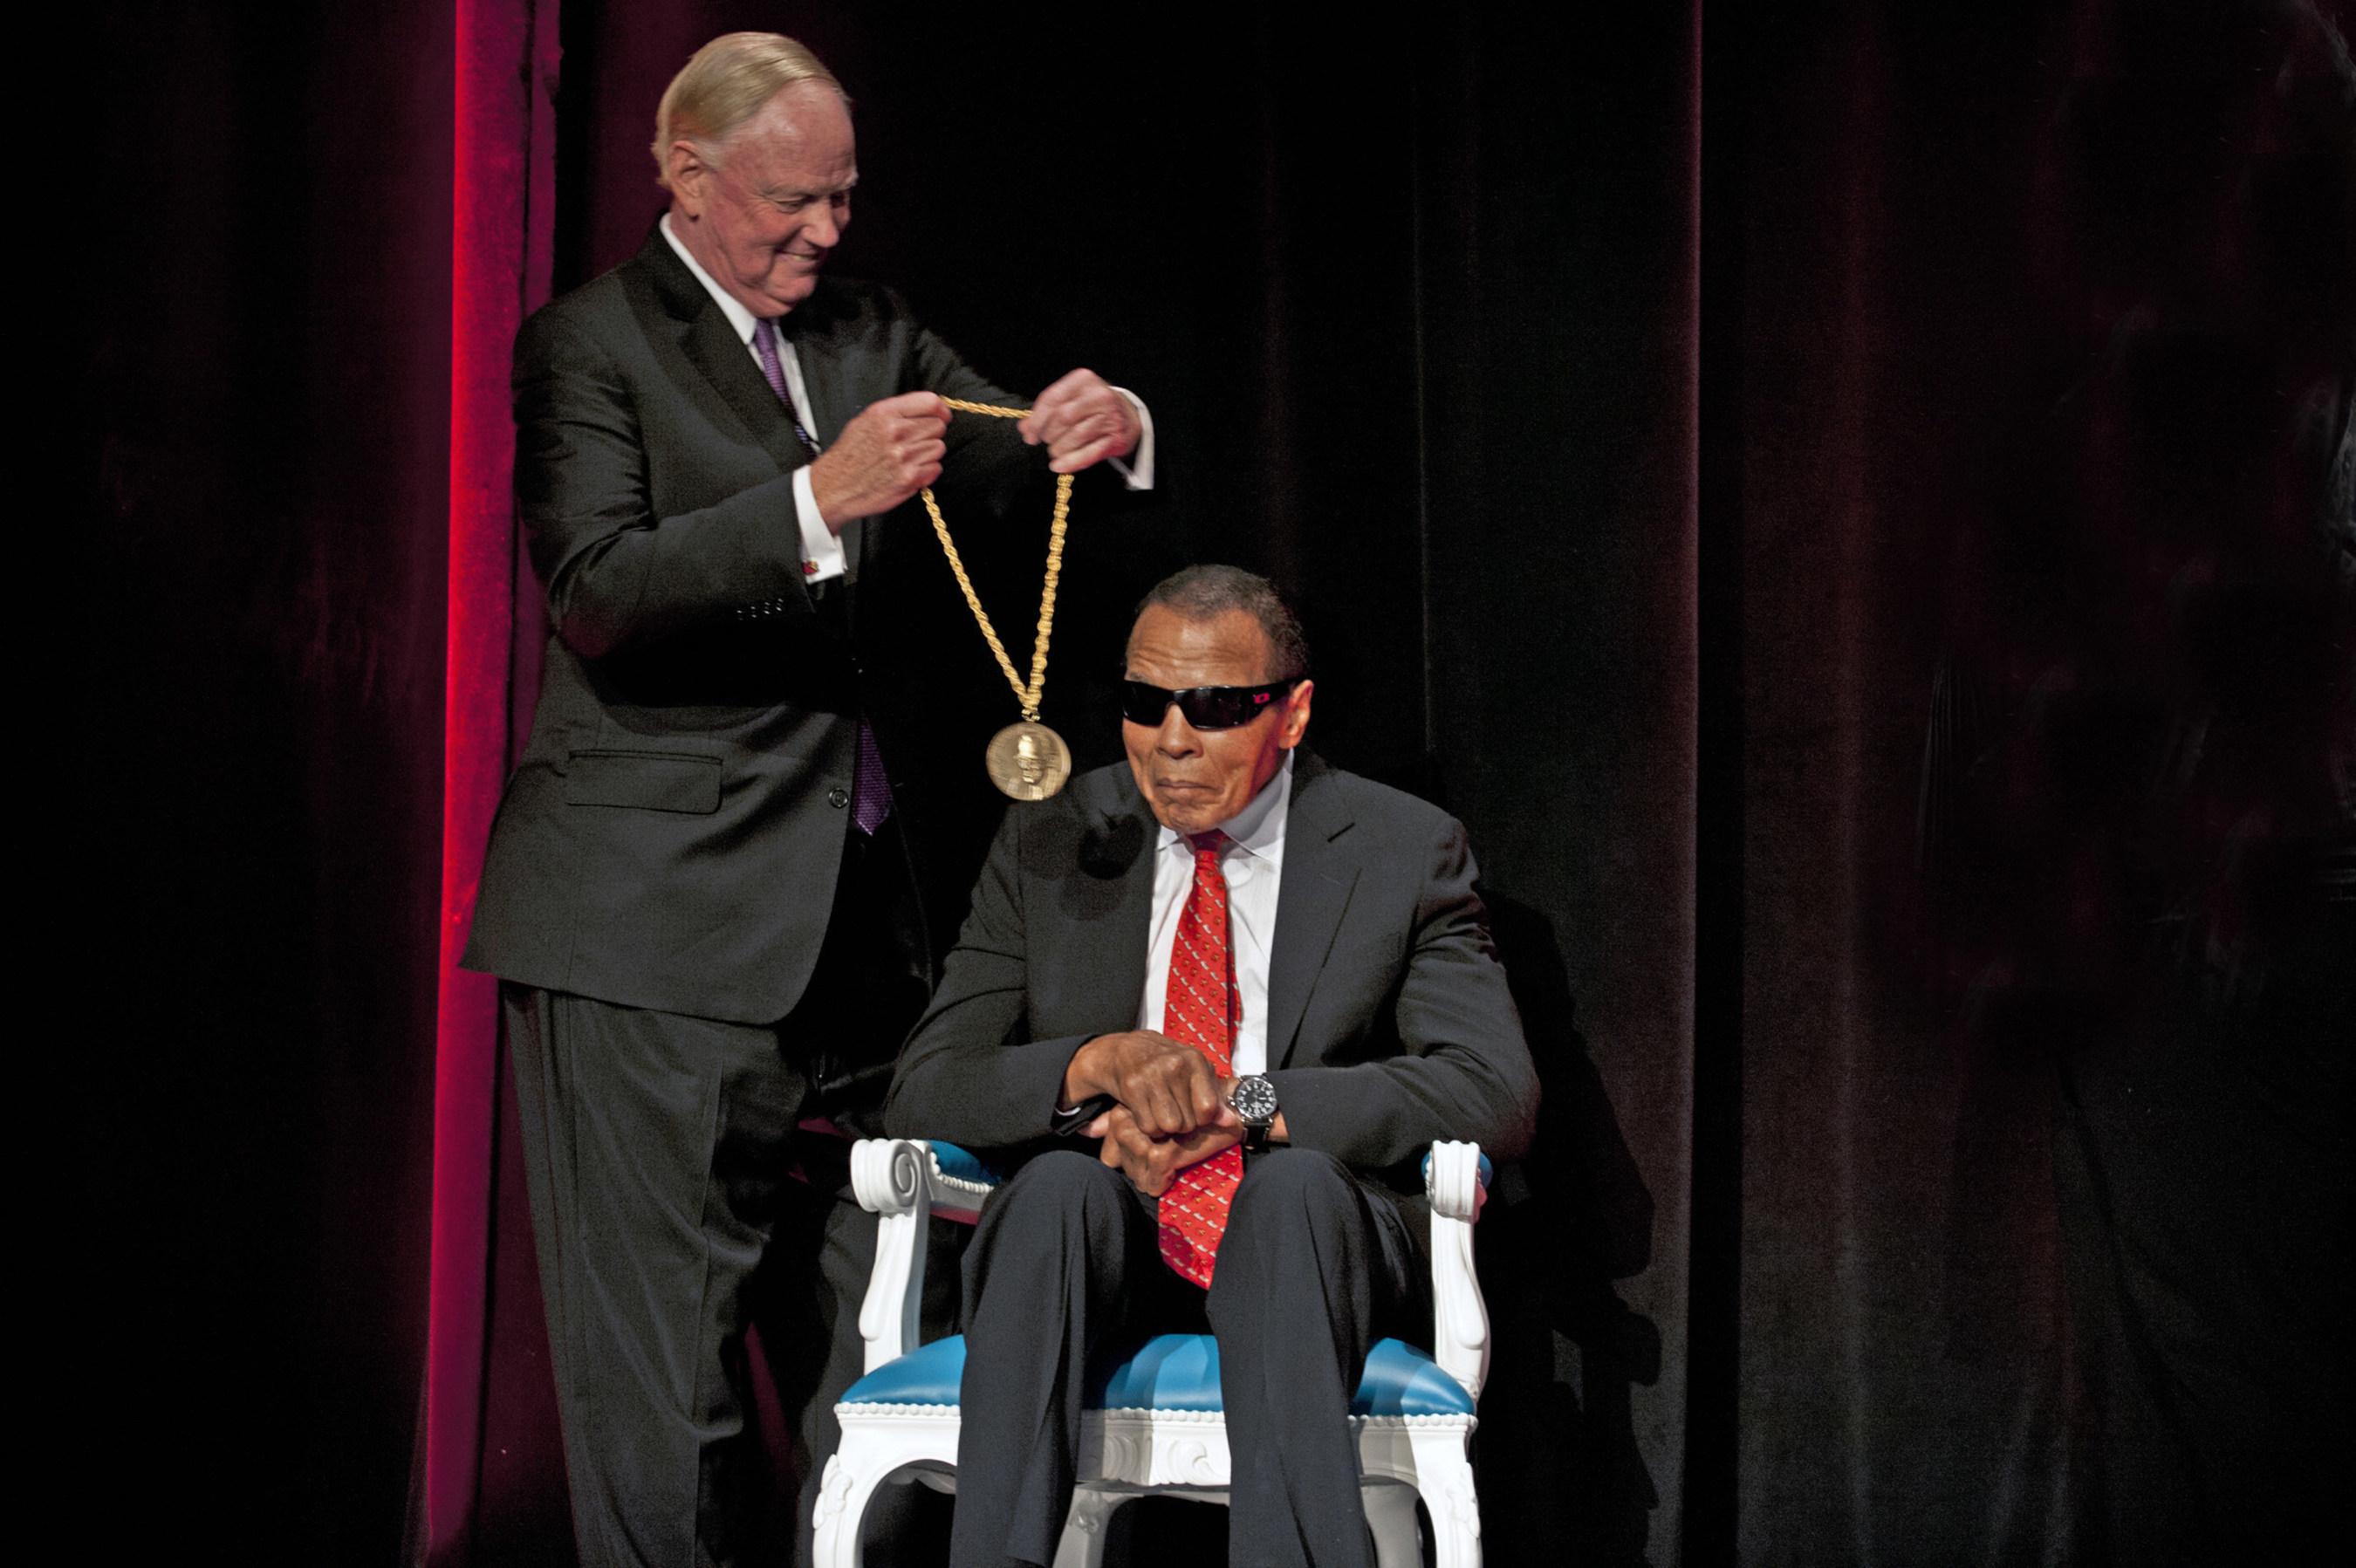 La University of Louisville presenta el Grawemeyer Spirit Award a Muhammad Ali